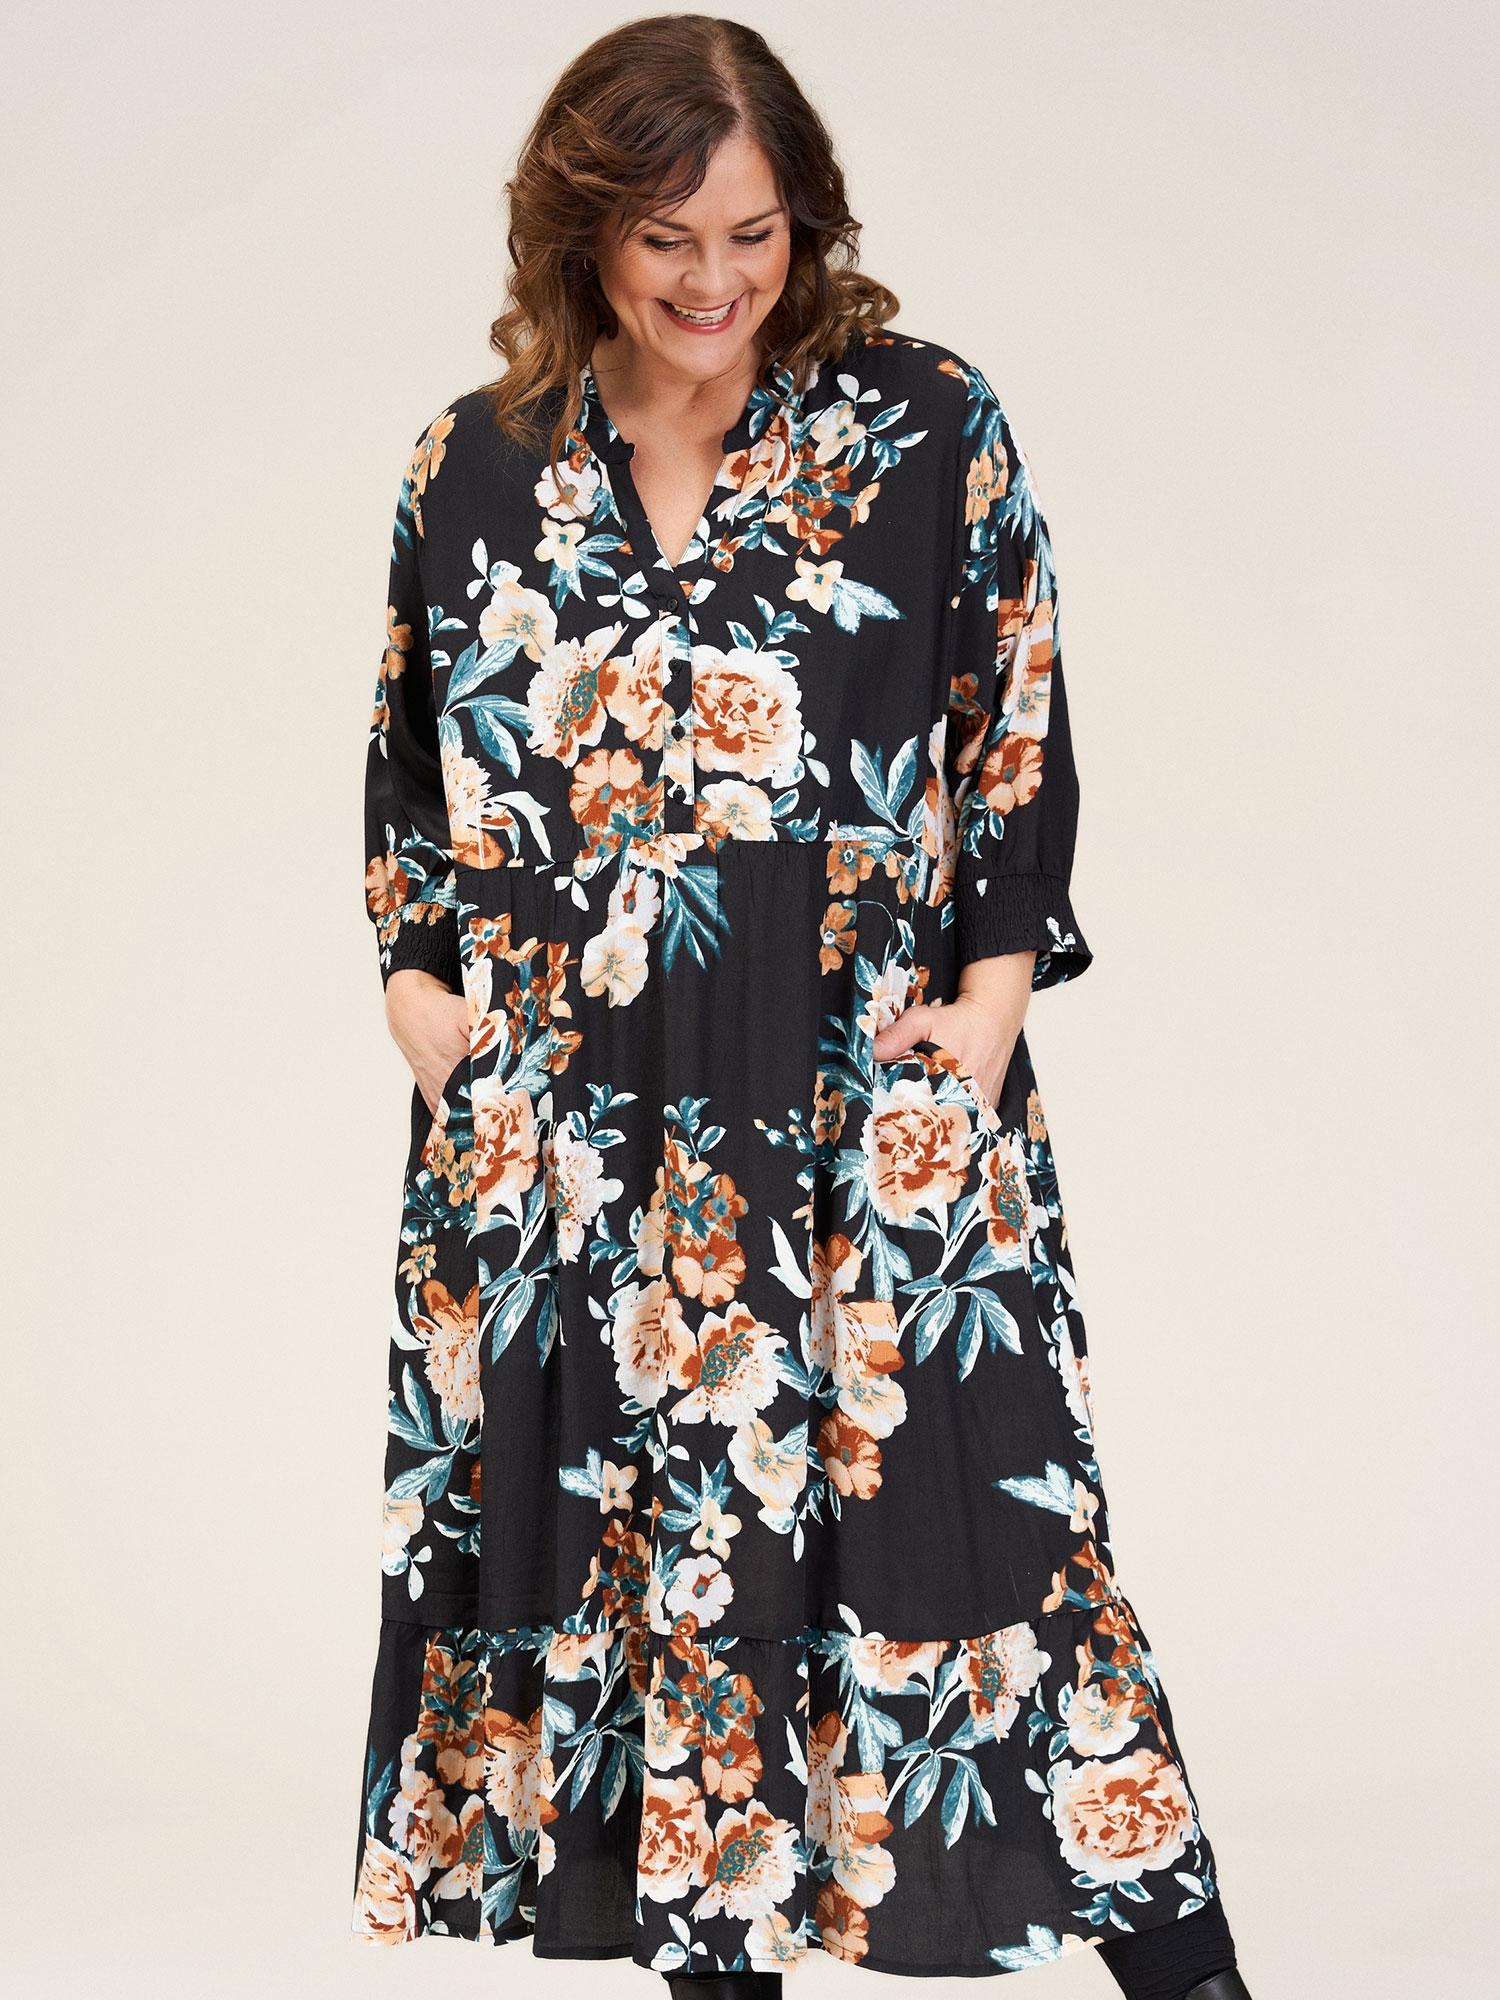 Gozzip Lang sort viskose kjole med smukt blomsterprint, 50-52 / L